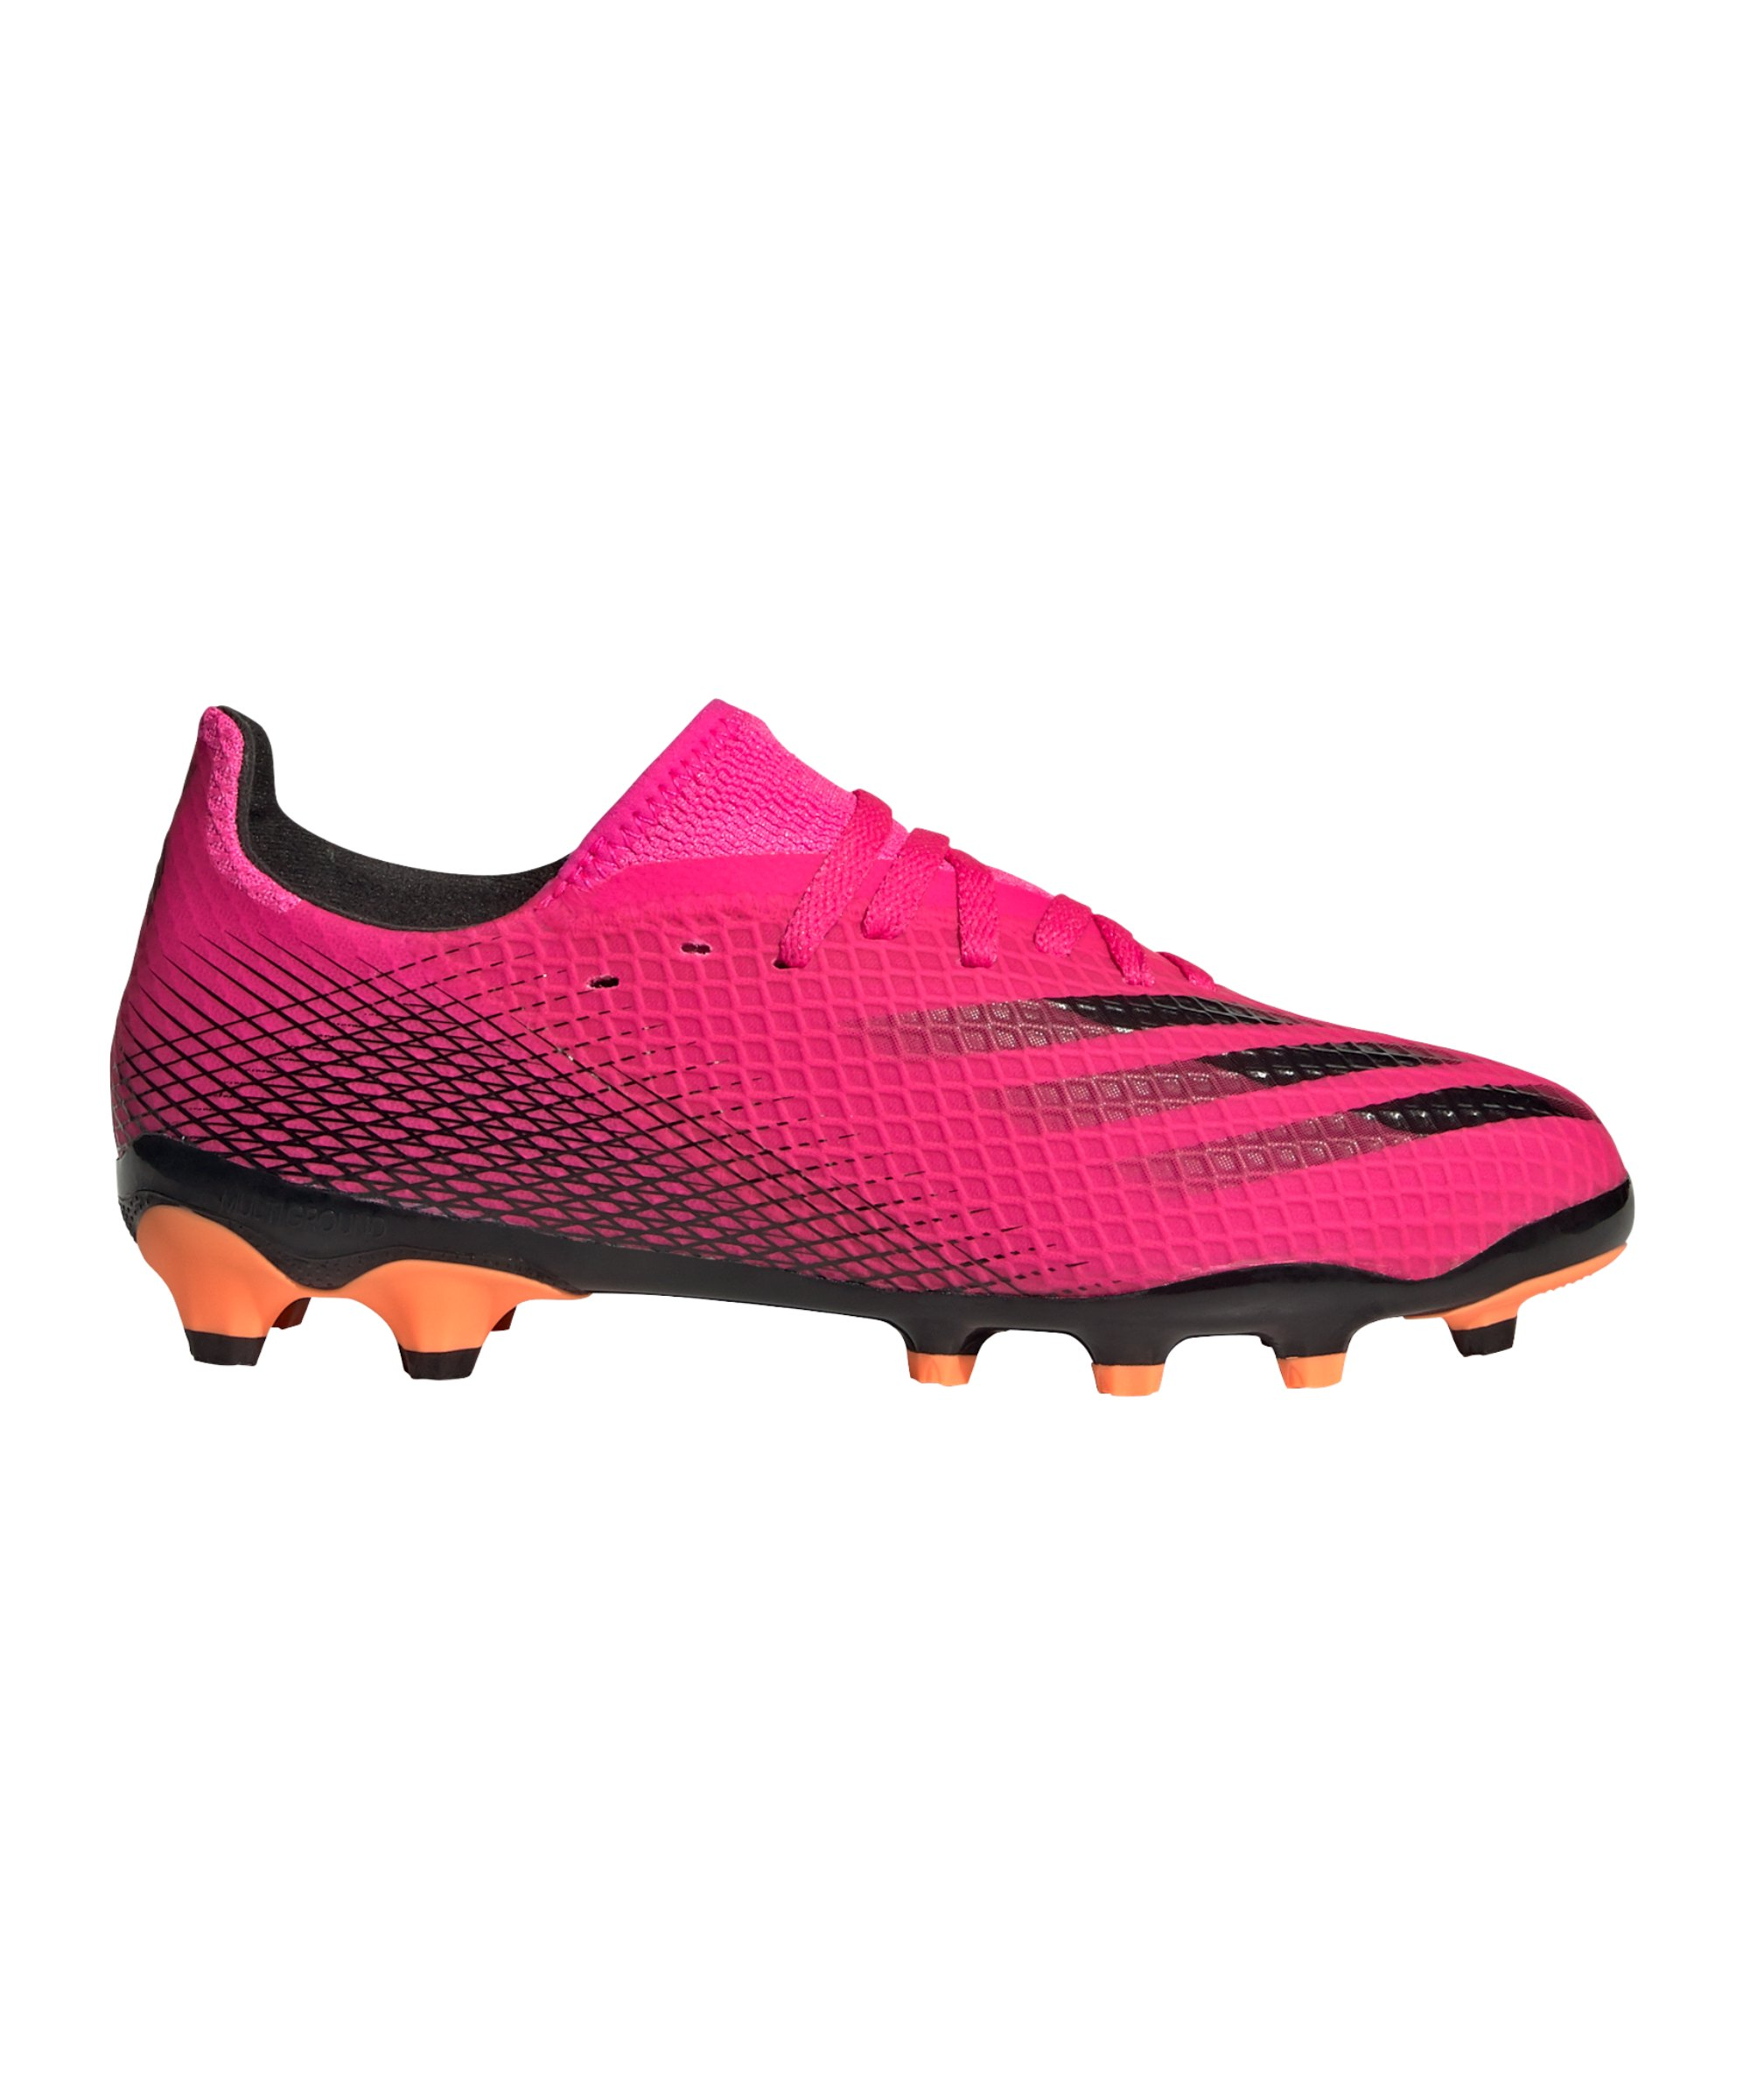 adidas X GHOSTED.3 MG Superspectral J Kids Pink Schwarz Orange - pink